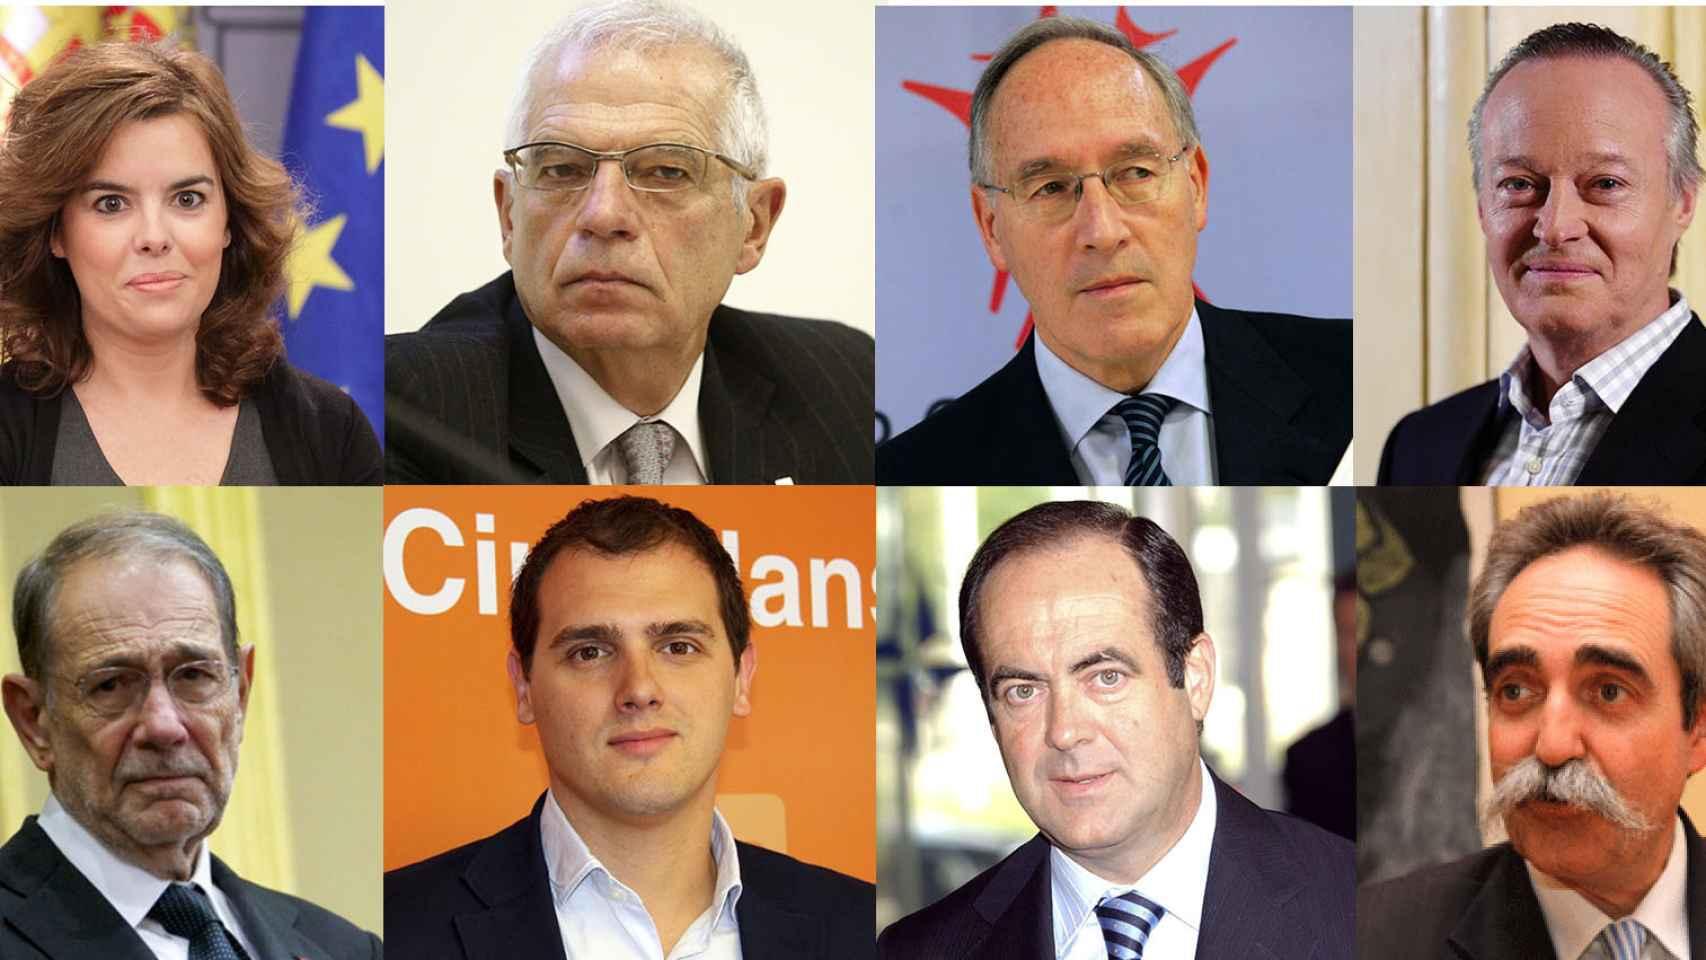 Sáez de Santamaría, Borrell, Pizarro, Piqué, Solana, Rivera, Bono y Zufiría.